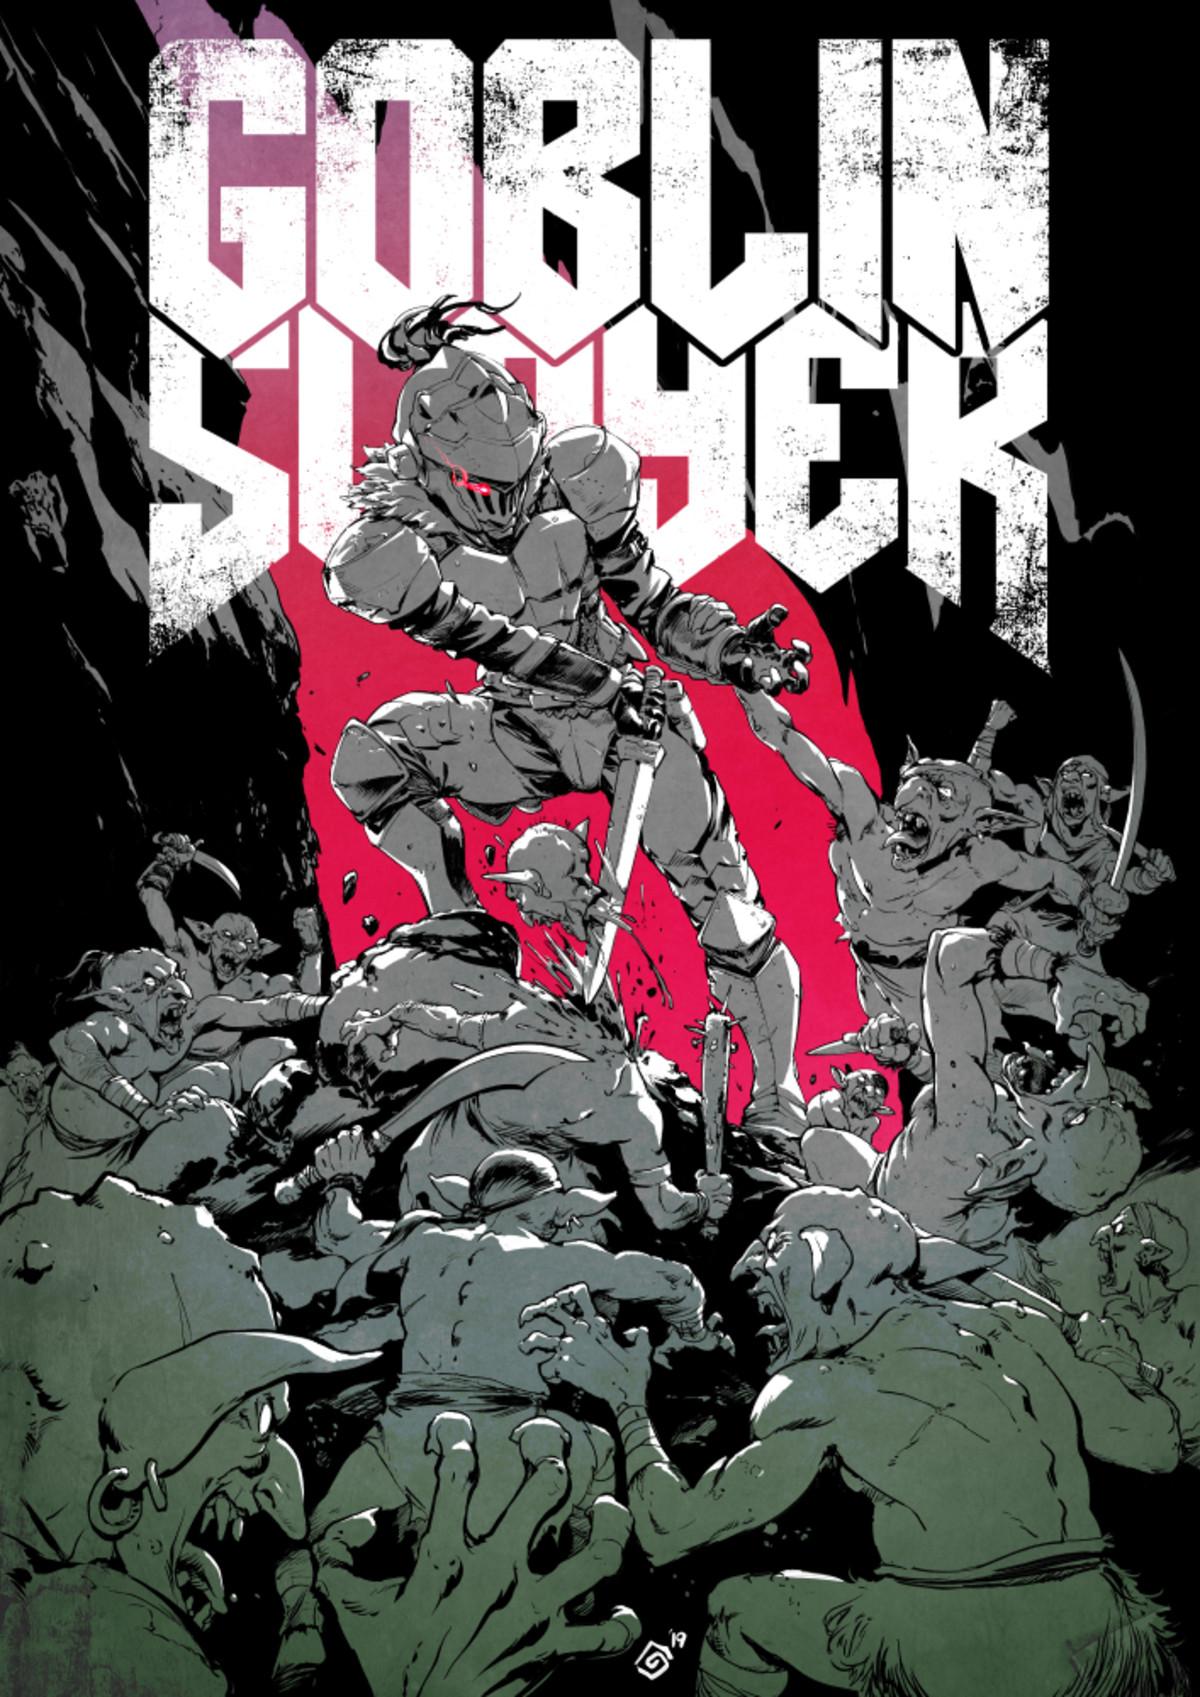 Goblin Slayer x Doom. .. Here's an older but similar image for ya.